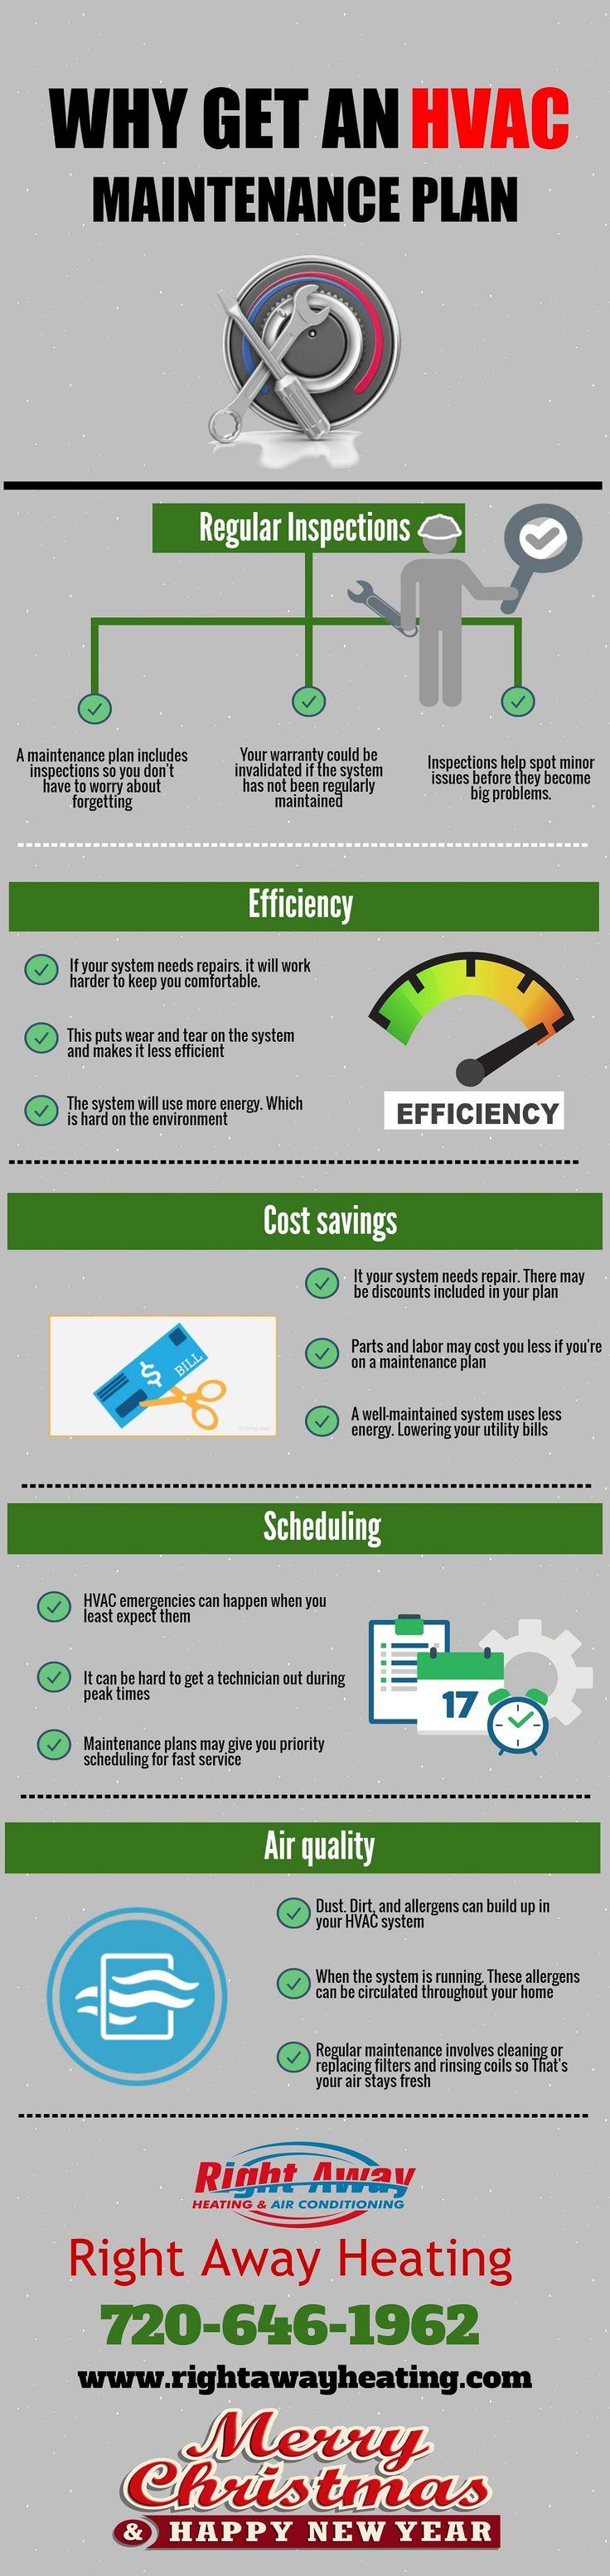 Why Get an HVAC Maintenance Plan